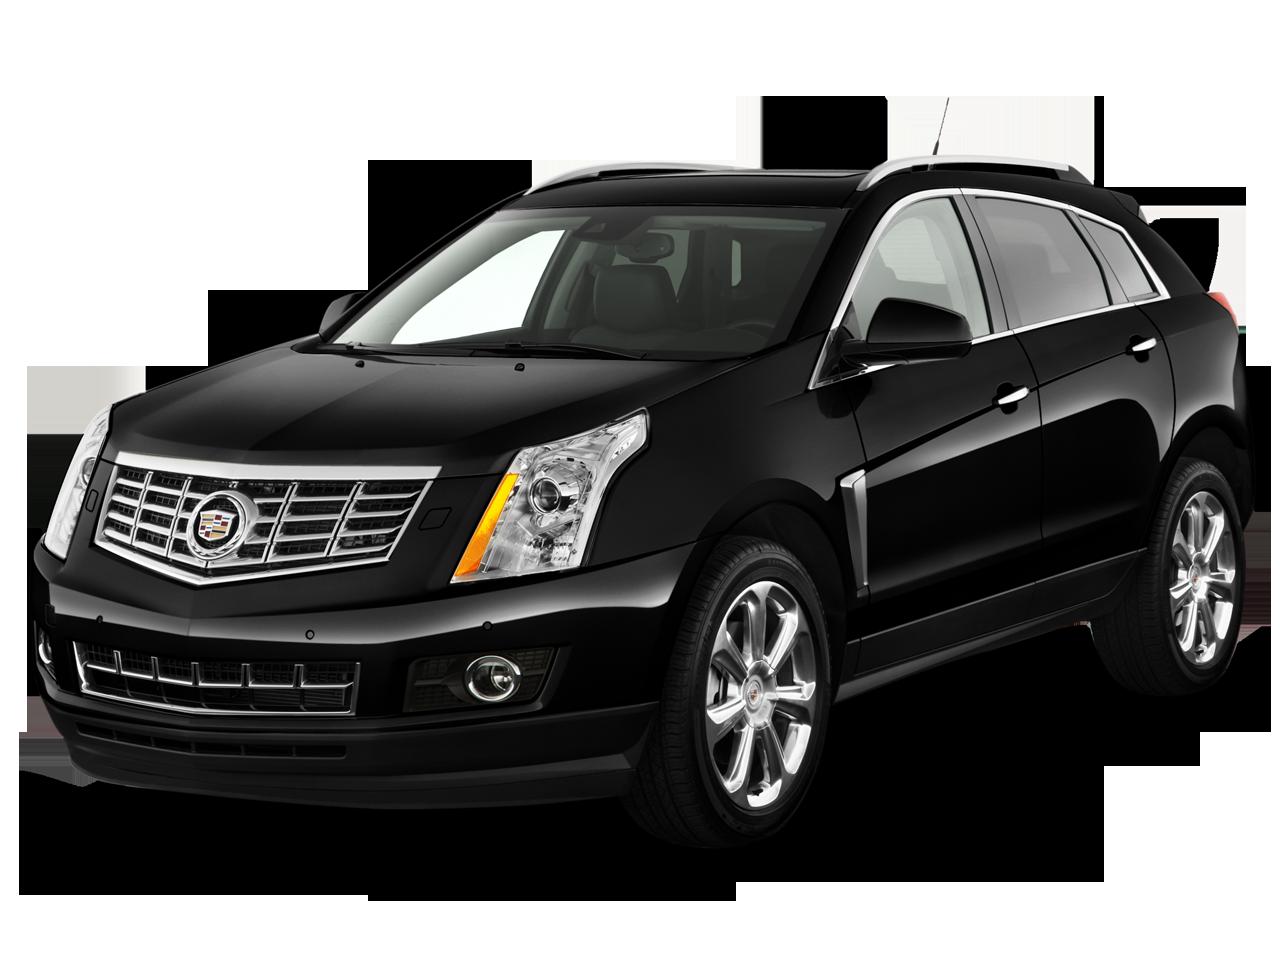 Cadilac car clipart vector black and white download 13 Cadillac Car Load20180523 Pngimg004 - Stickers | PNG vector black and white download